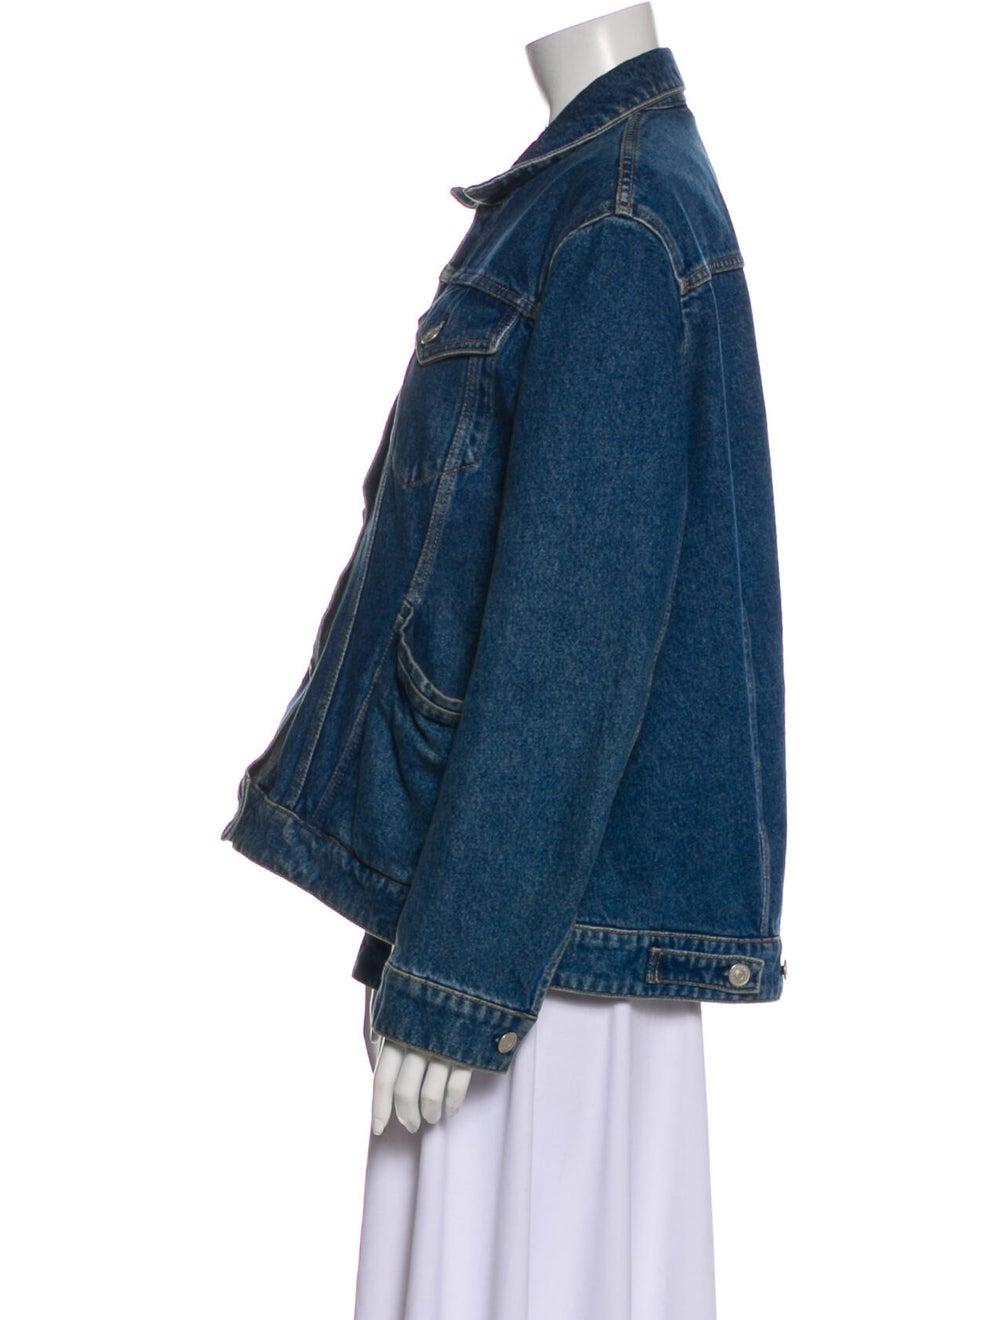 Balenciaga 2019 Denim Jacket Denim - image 2